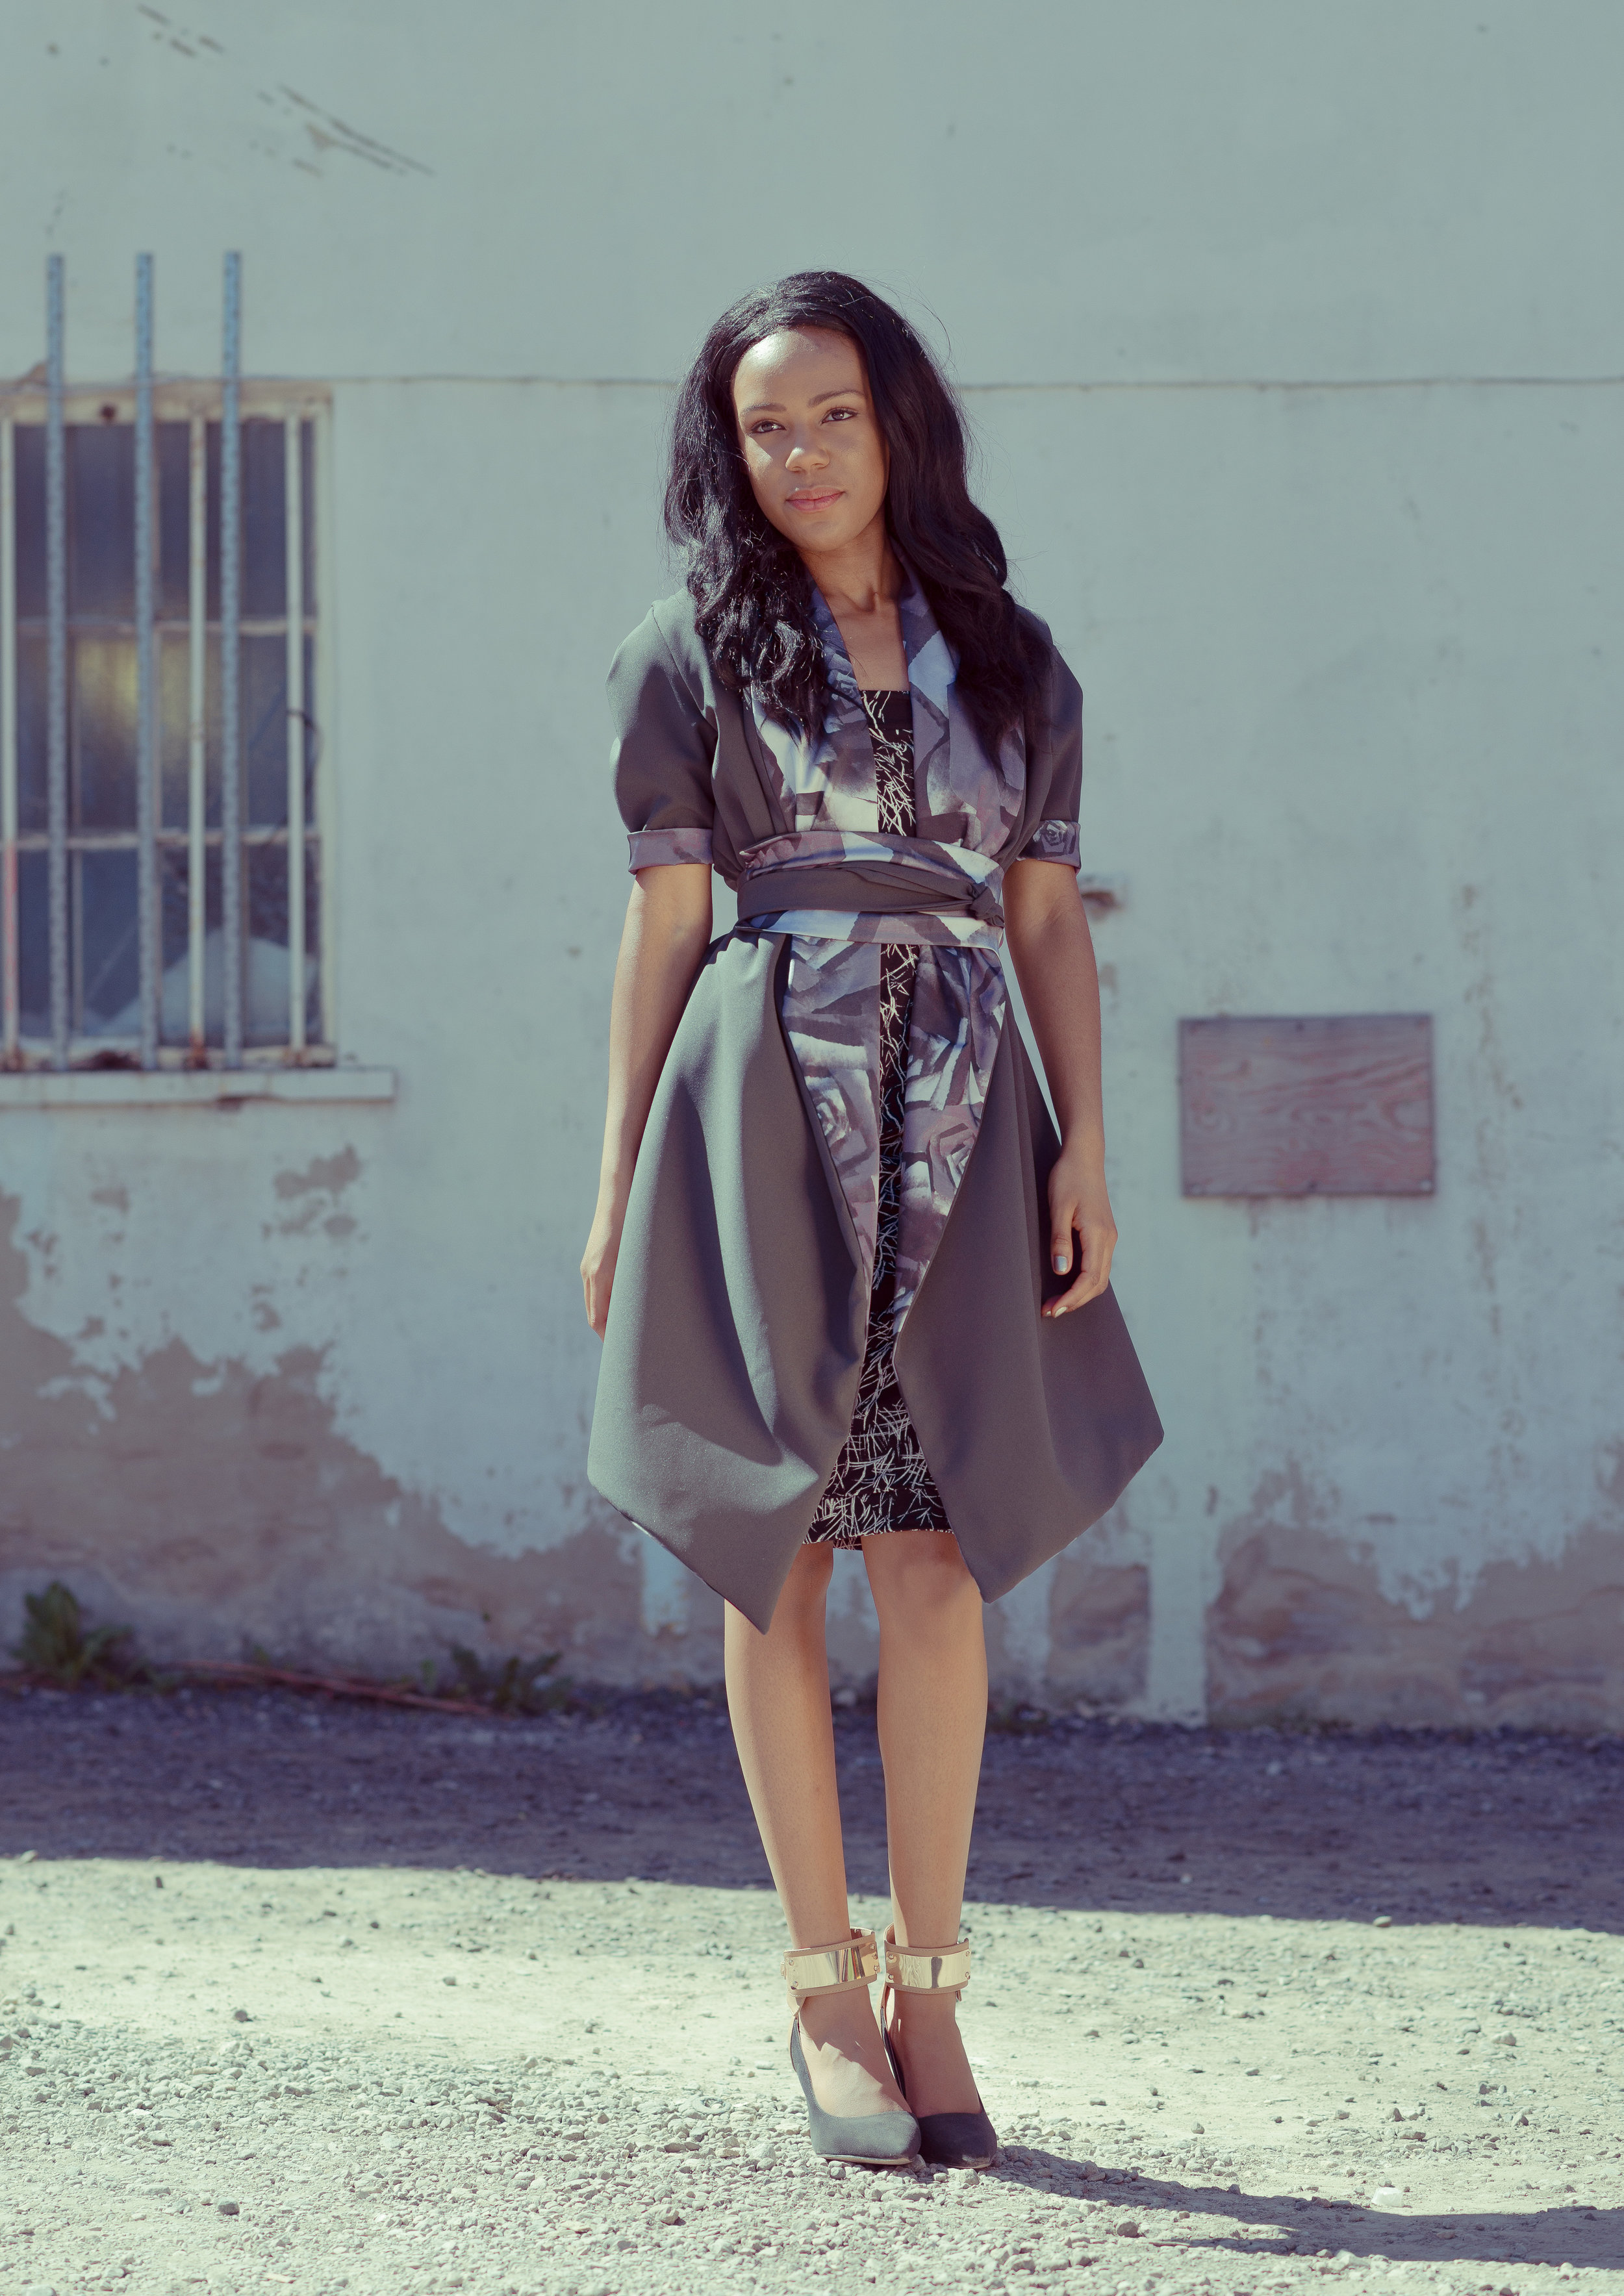 zaramia-ava-zaramiaava-leeds-fashion-designer-ethical-sustainable-tailored-minimalist-mai-grey-print-black-jacket-belt-point-skirt-versatile-drape-cowl-styling-womenswear-models-8